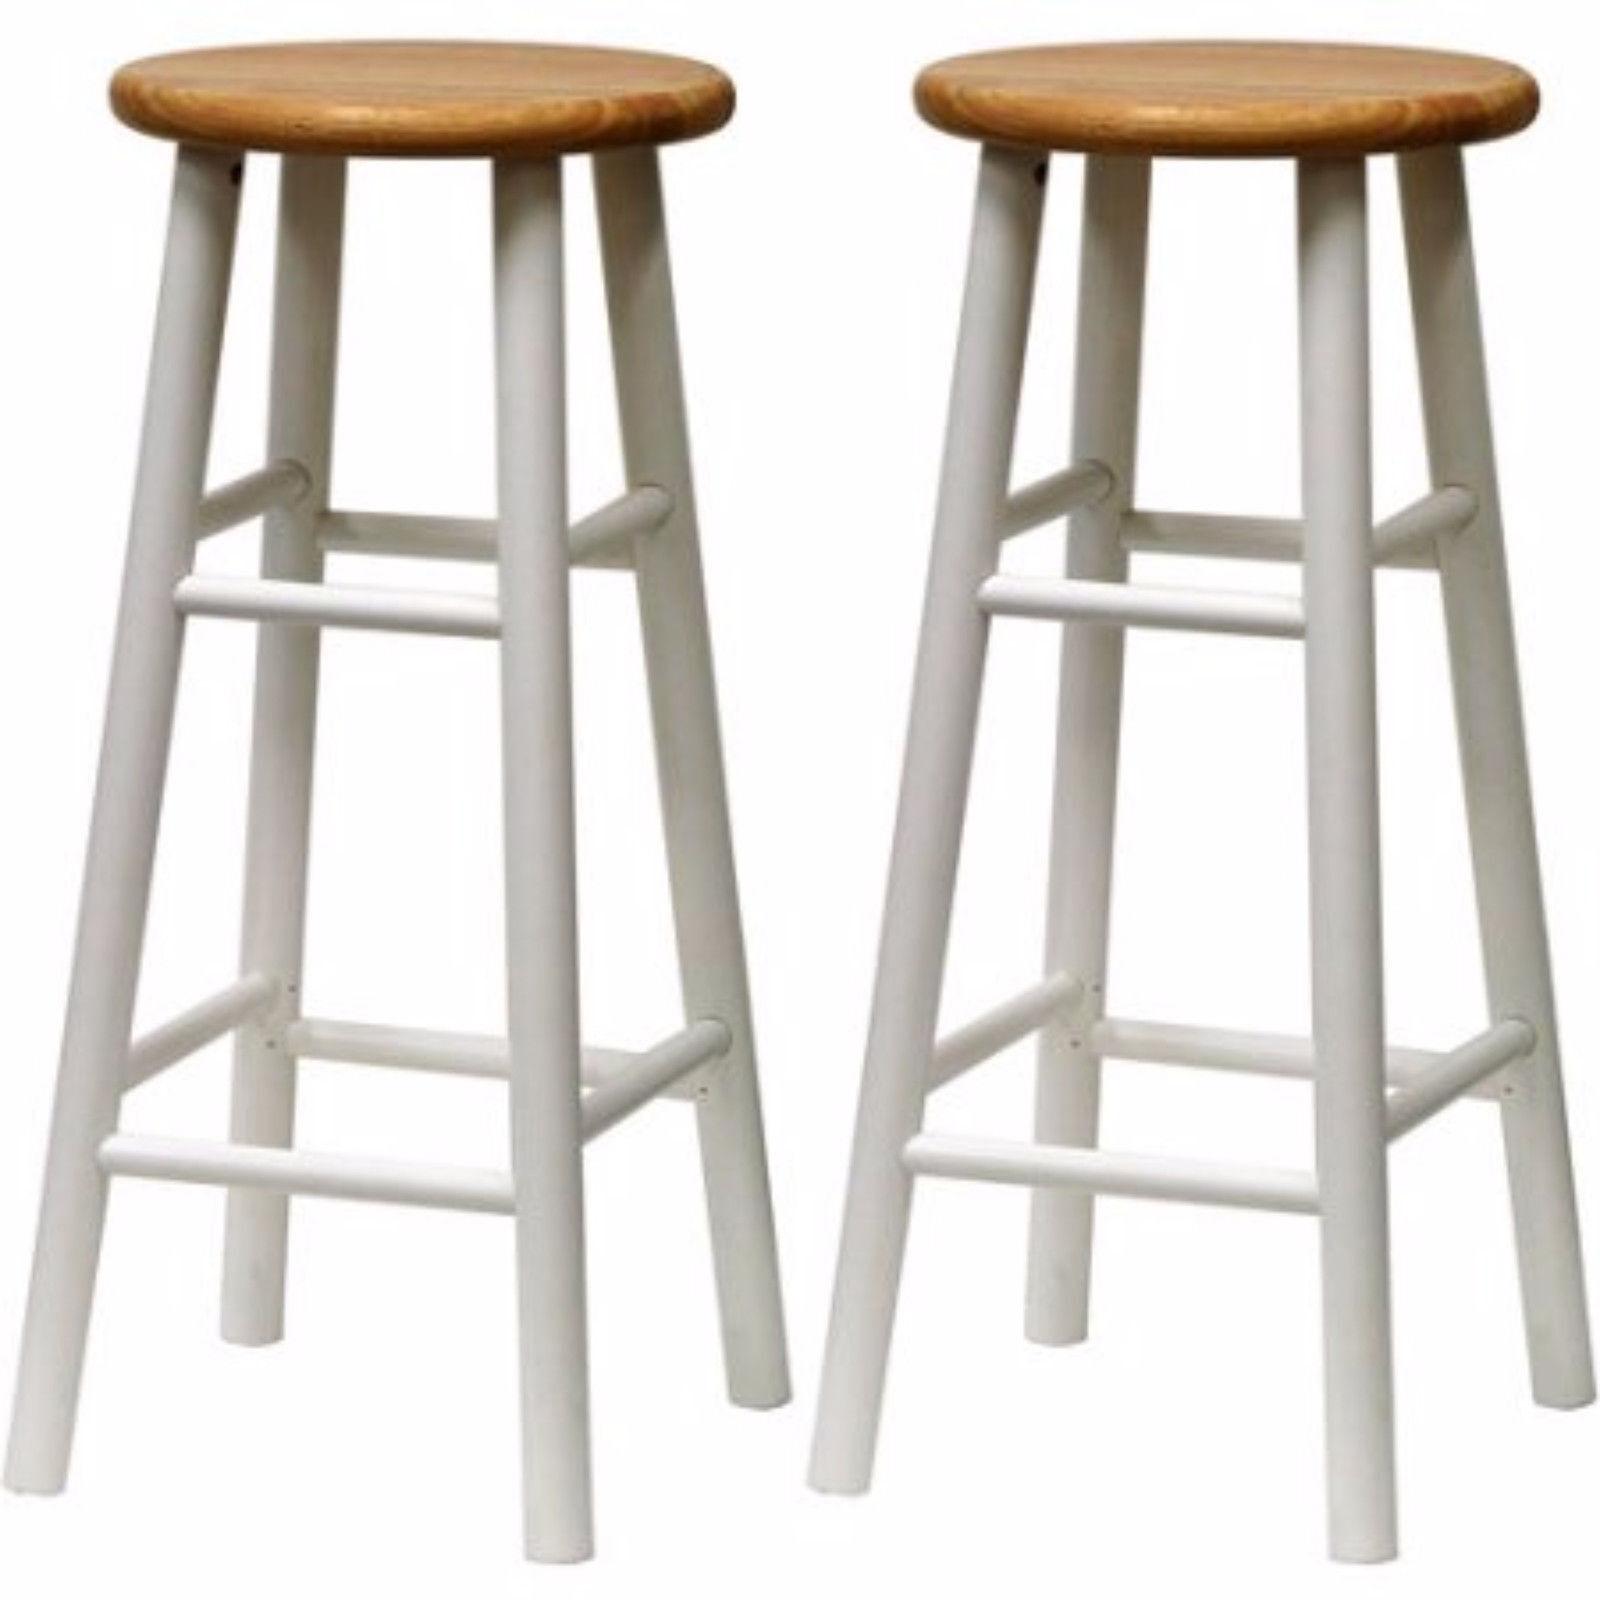 Wooden Bar Stools Beveled Seat 30 Inch Beech Wood Bar Stools Set Of